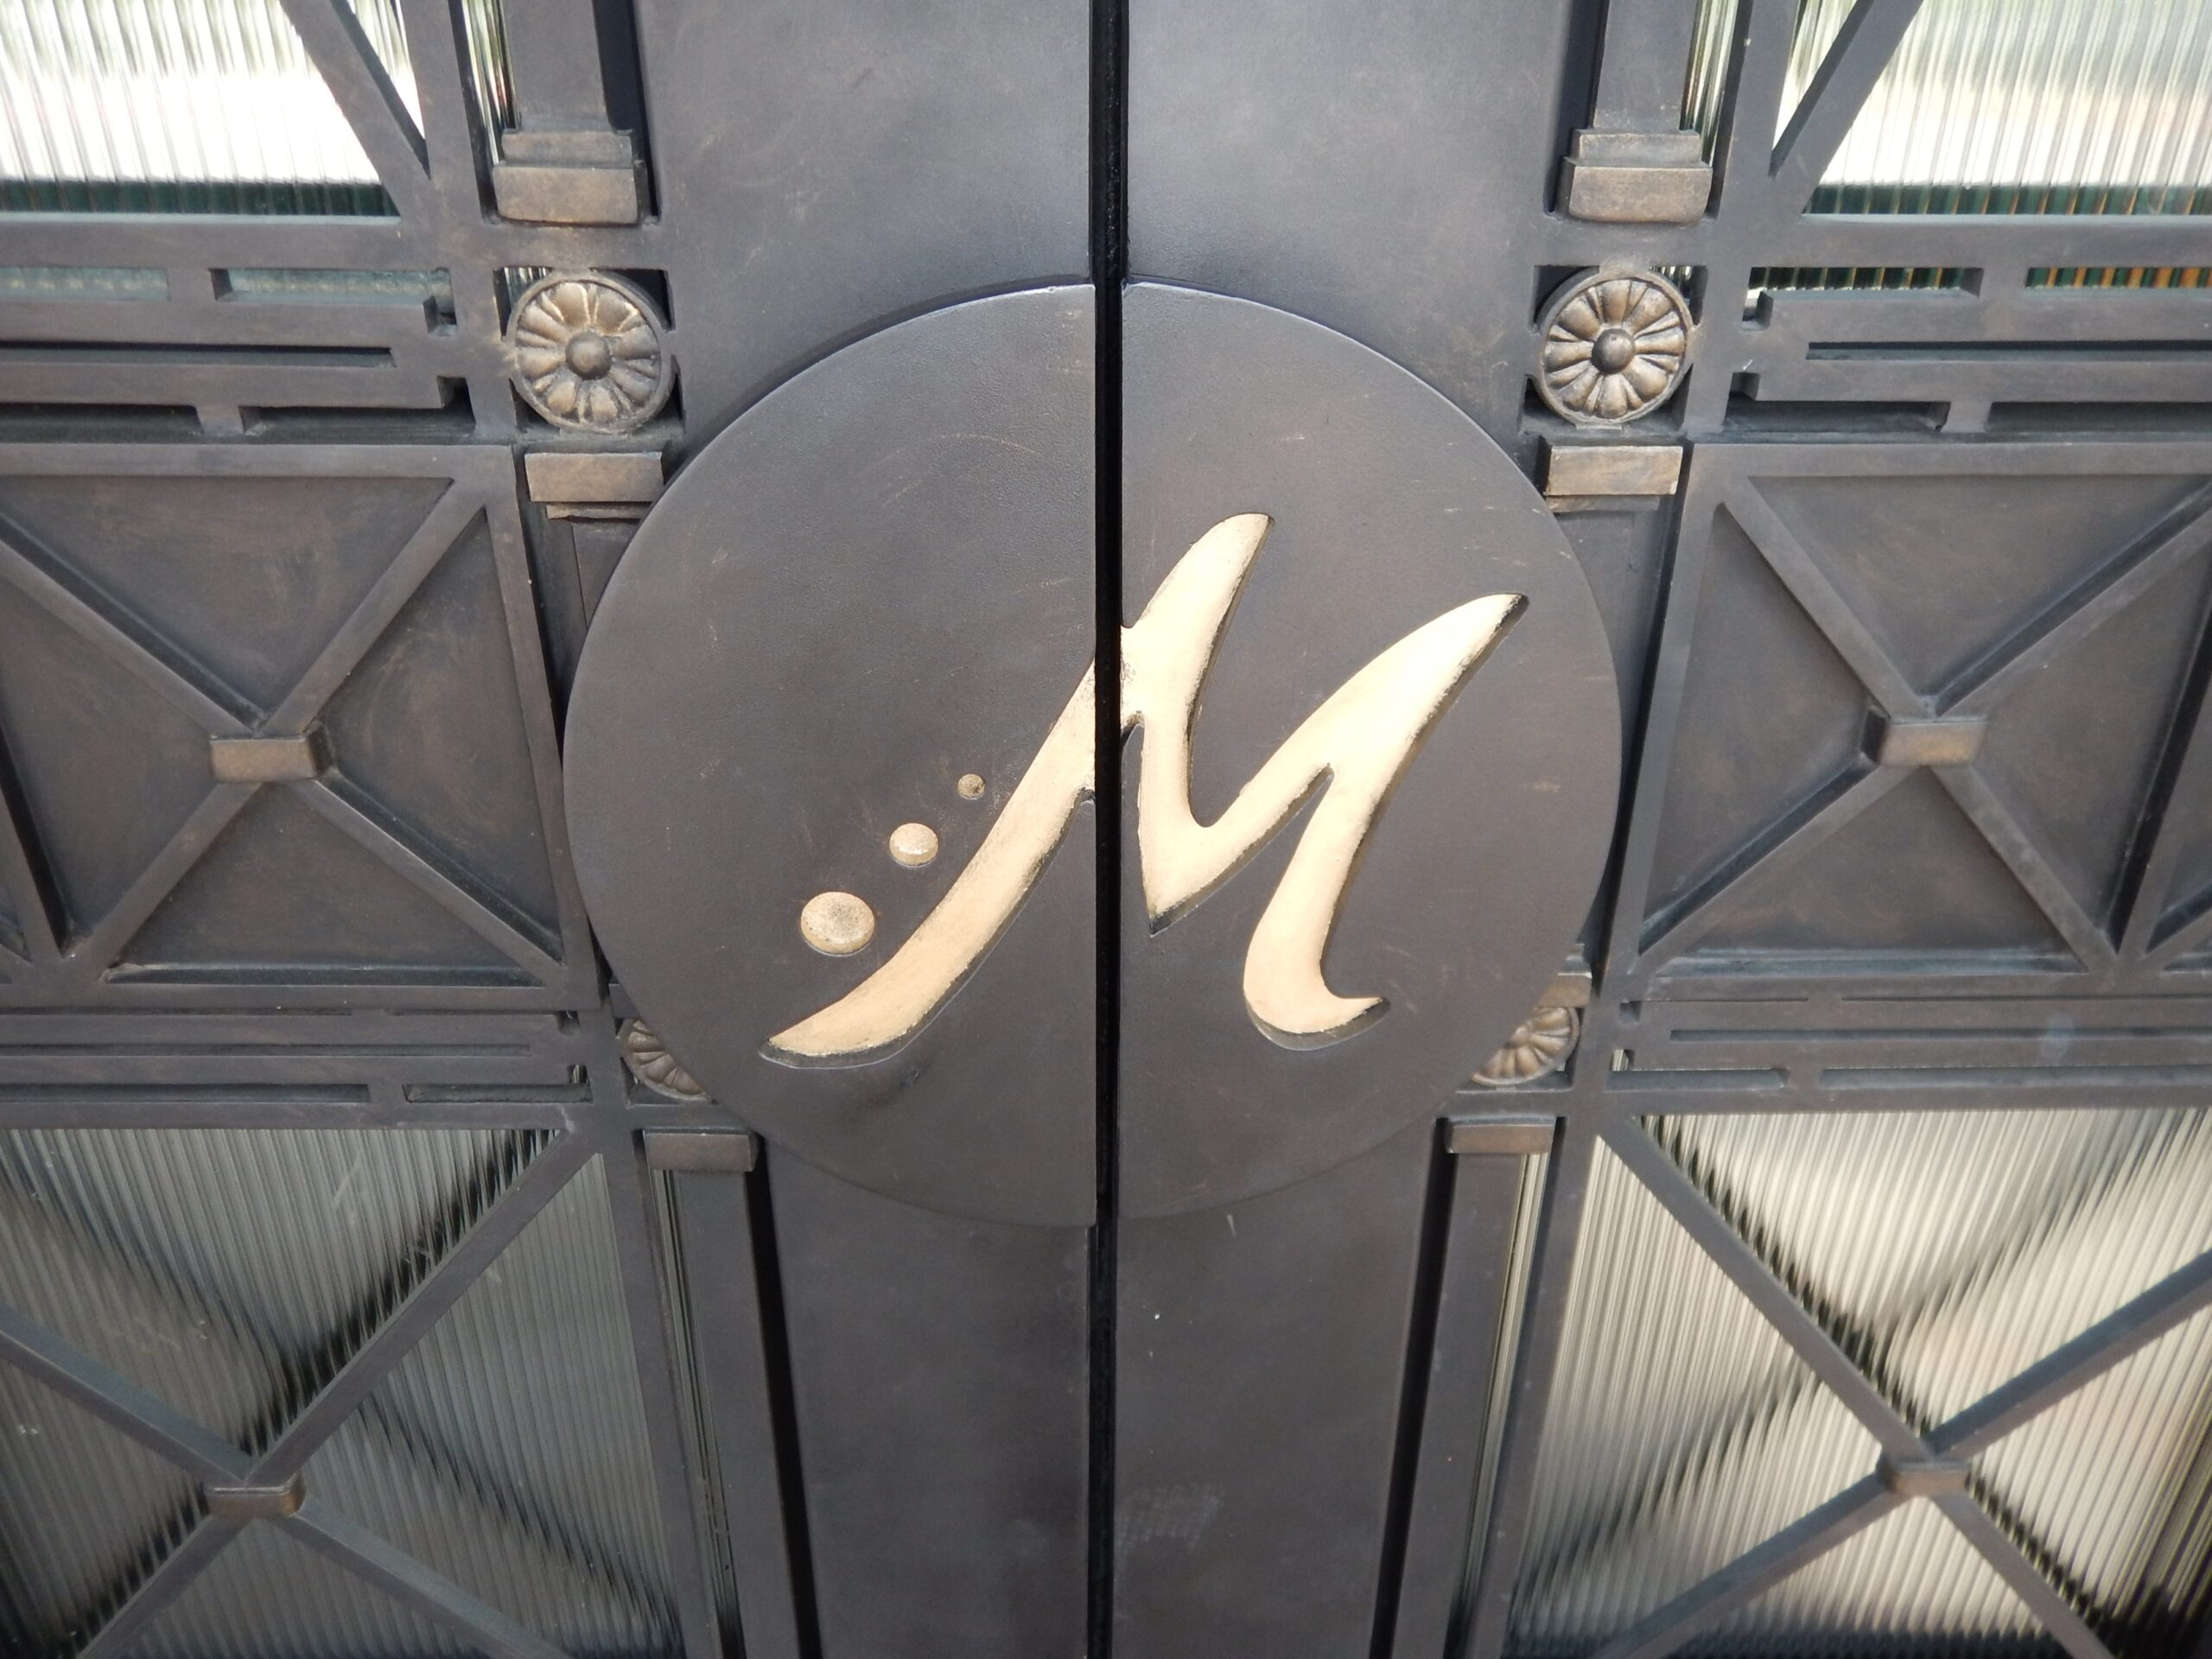 Miguel's-Restaurant-Midland-TX-Steel-commercial-Main-Door-Entry-windows-railings-lighting-Avanti-OLS-MOD-B003 (11)